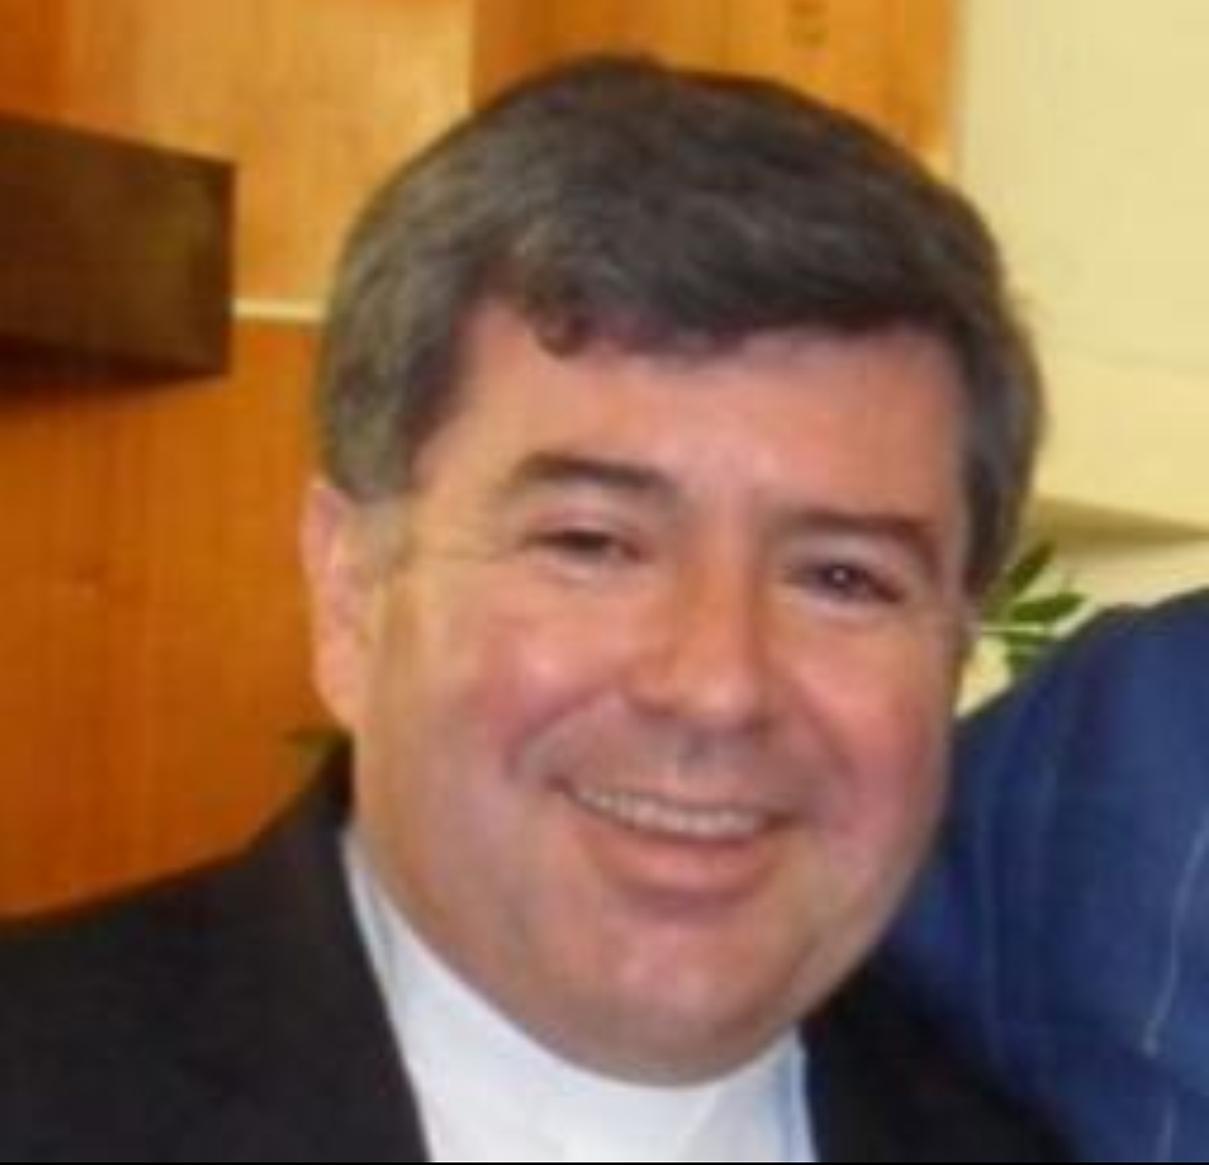 Feligreses lamentan muerte por Covid-19 del sacerdote Fausto Silva Omaña